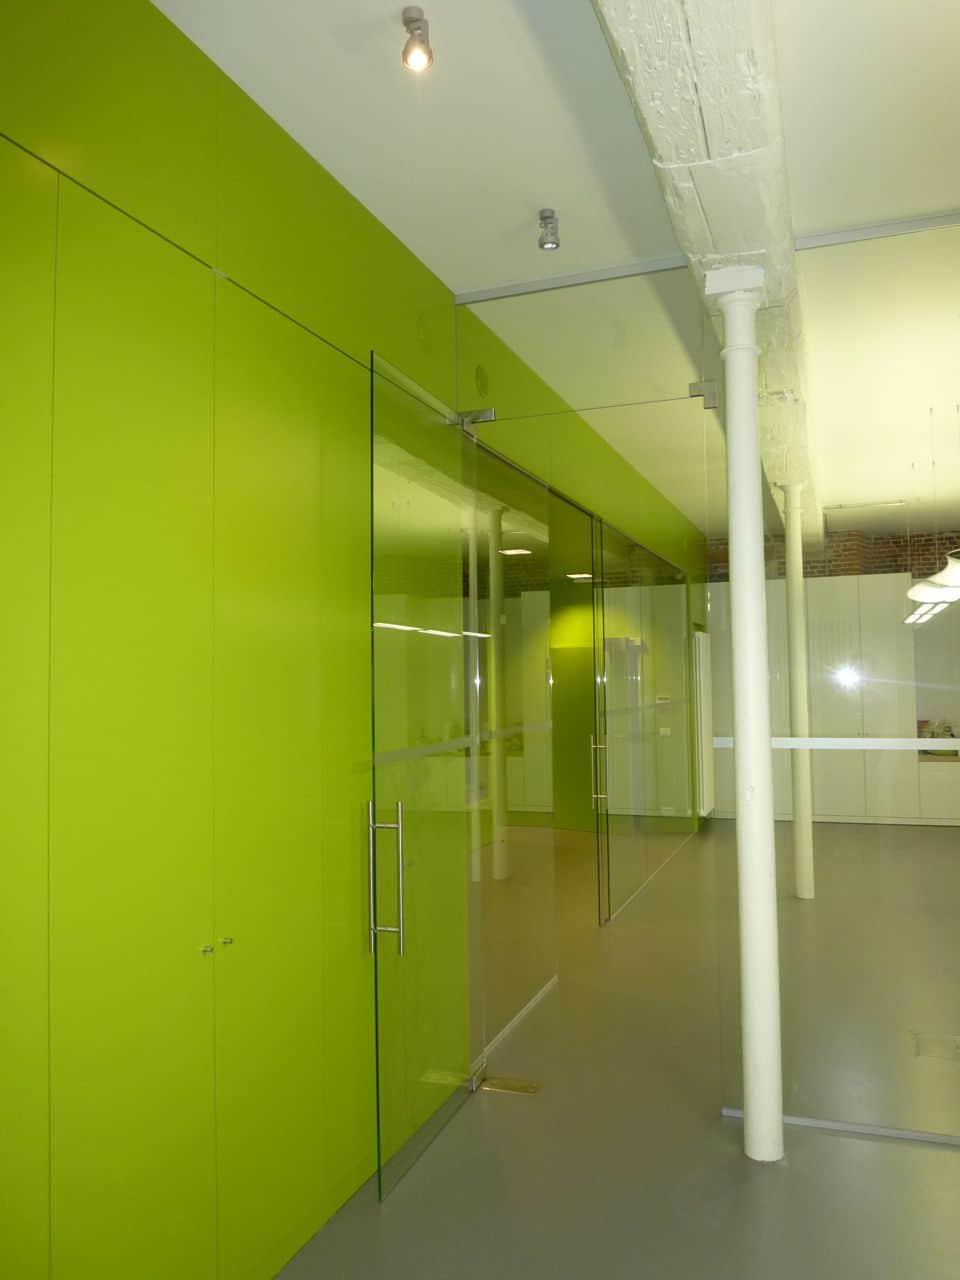 P1060729 | Baeyens & Beck architecten Gent | architect nieuwbouw renovatie interieur | high end | architectenbureau